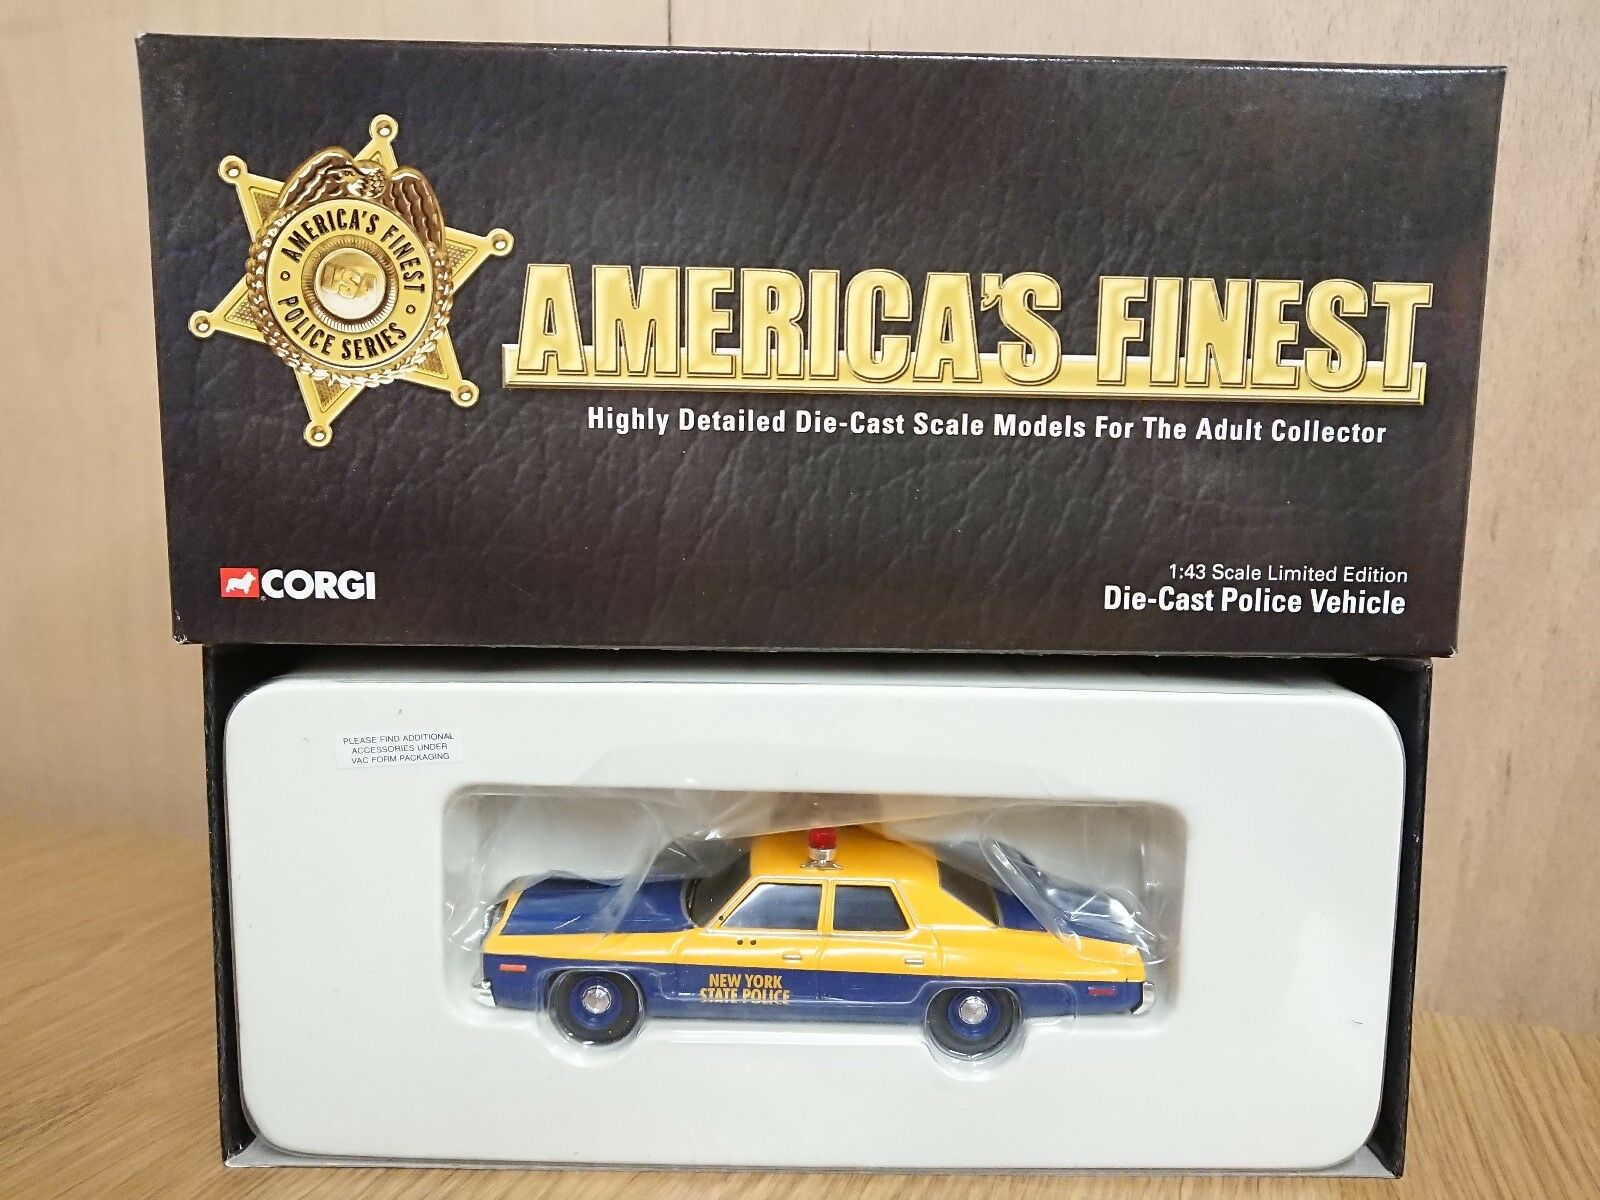 Corgi US06006 America's Finest Dodge Monaco New York State Police Ltd Edition